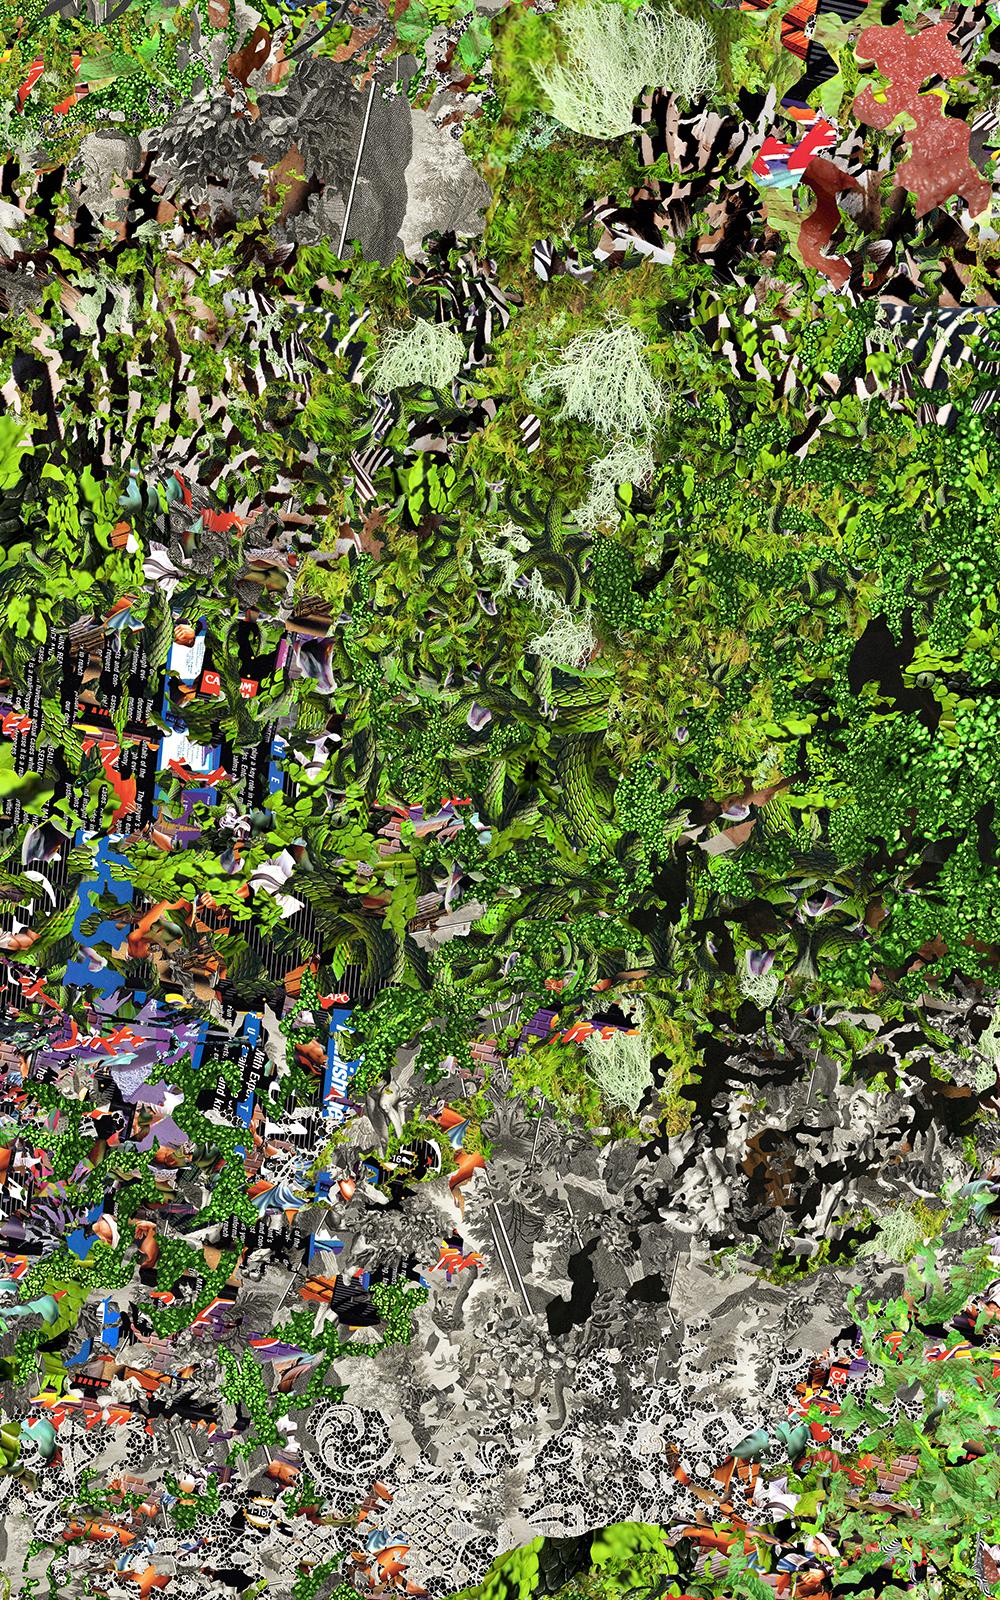 Case Simmons, Simmons & Burke, Sweet Green, Dutchmasters, Kohn Gallery,Pigment Print, Digital Collage,Digital Art, Photoshop Collage, Contemporary Collage, Photoshop Actions, Case Simmons Art, Collage Fine Art, Digital Landscape